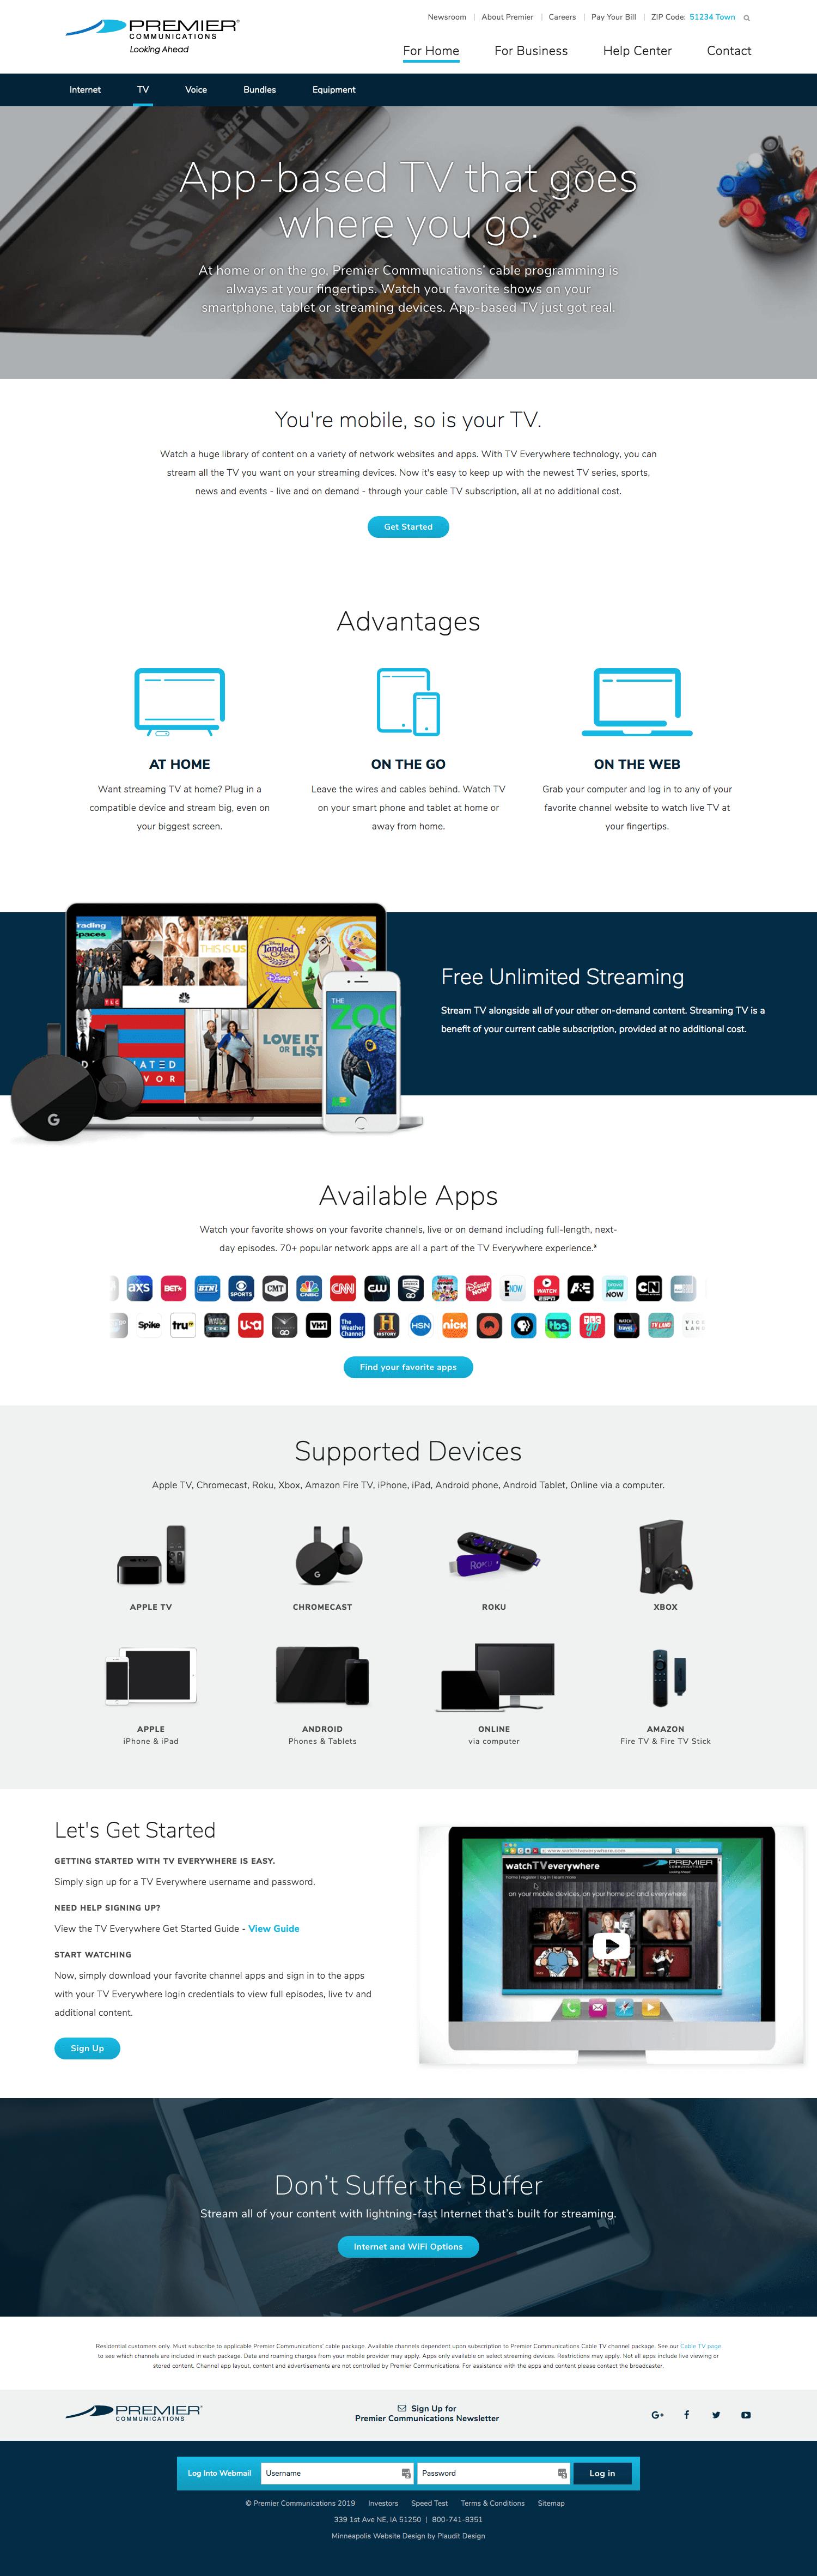 Premier Communications Website: Stream TV Page